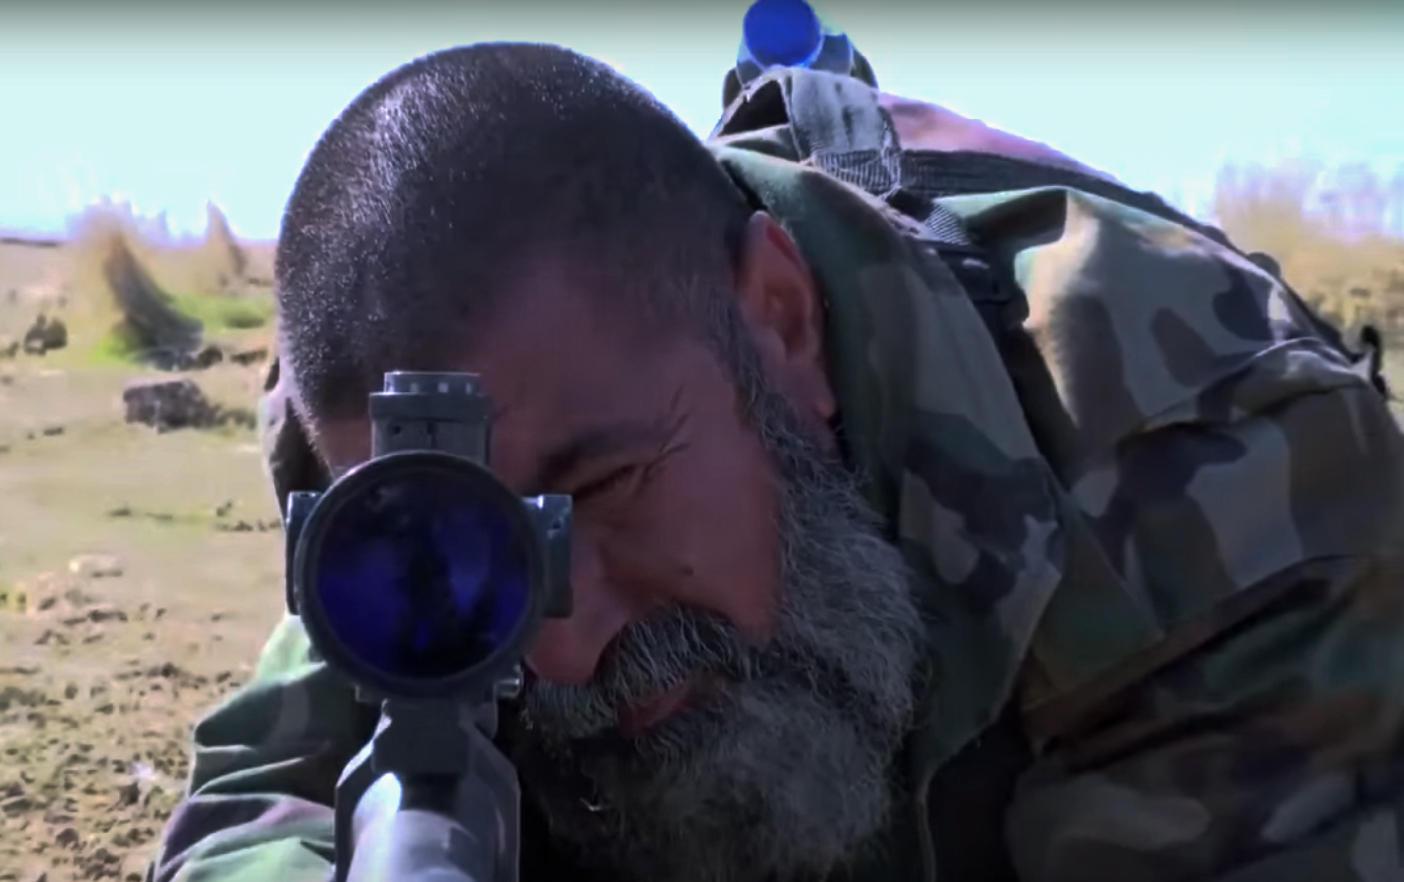 Entfernungsmesser Scharfschütze : Scharfschütze sniper trifft is kämpfer in metern entfernung